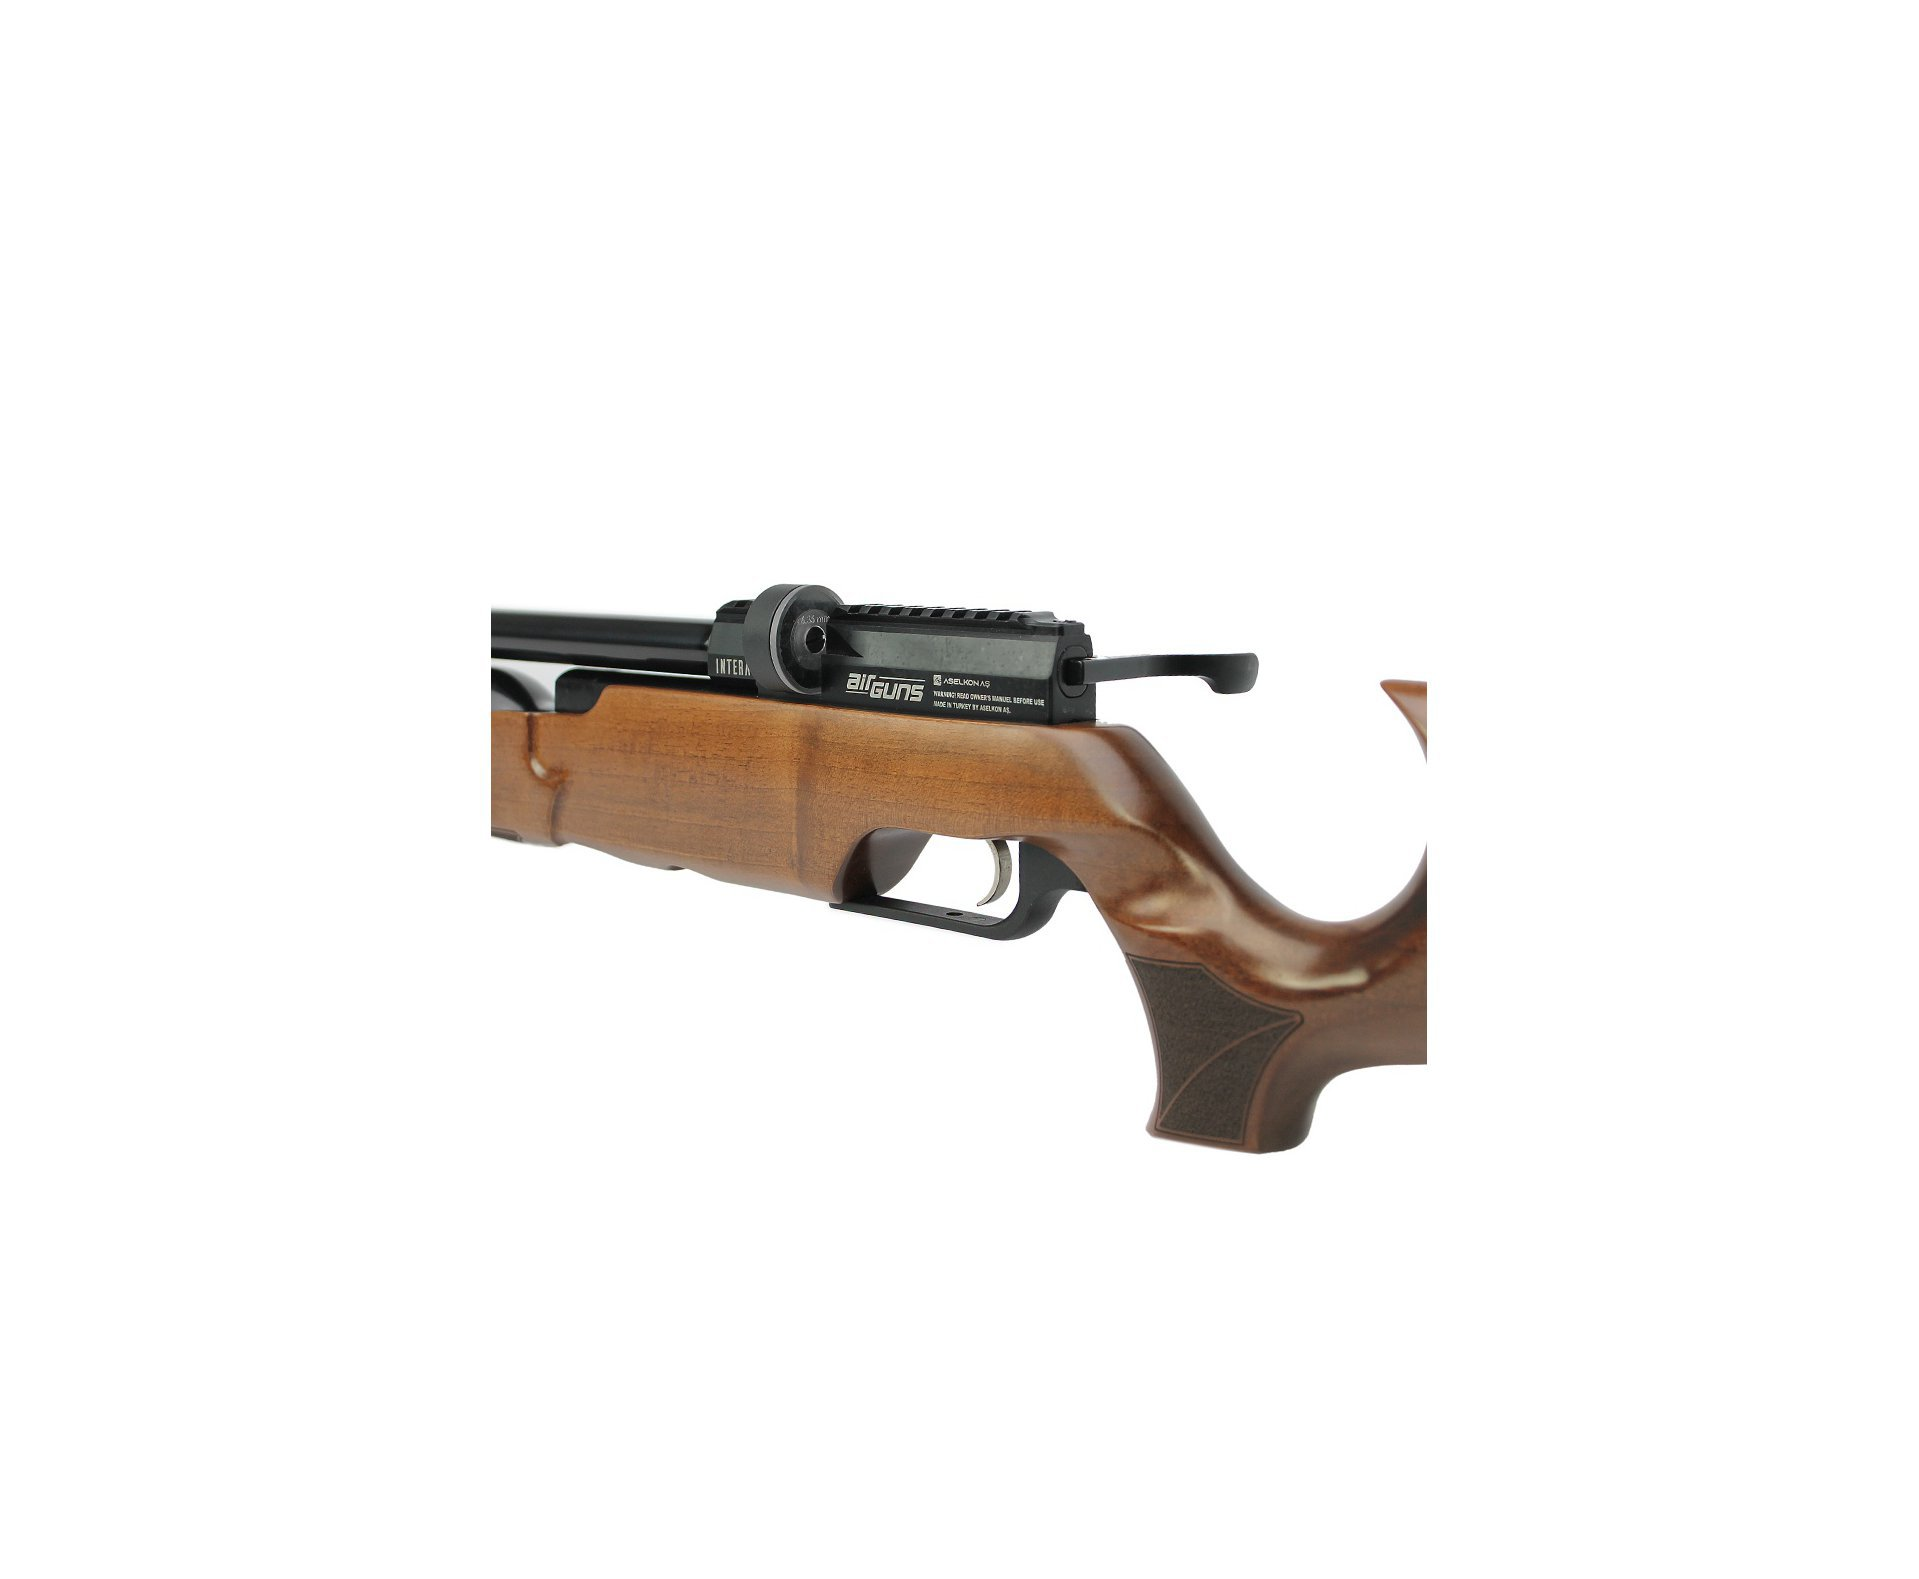 Artefato de Pressão PCP MX6 Matte Black Wood Regulated 6.35mm Aselkon